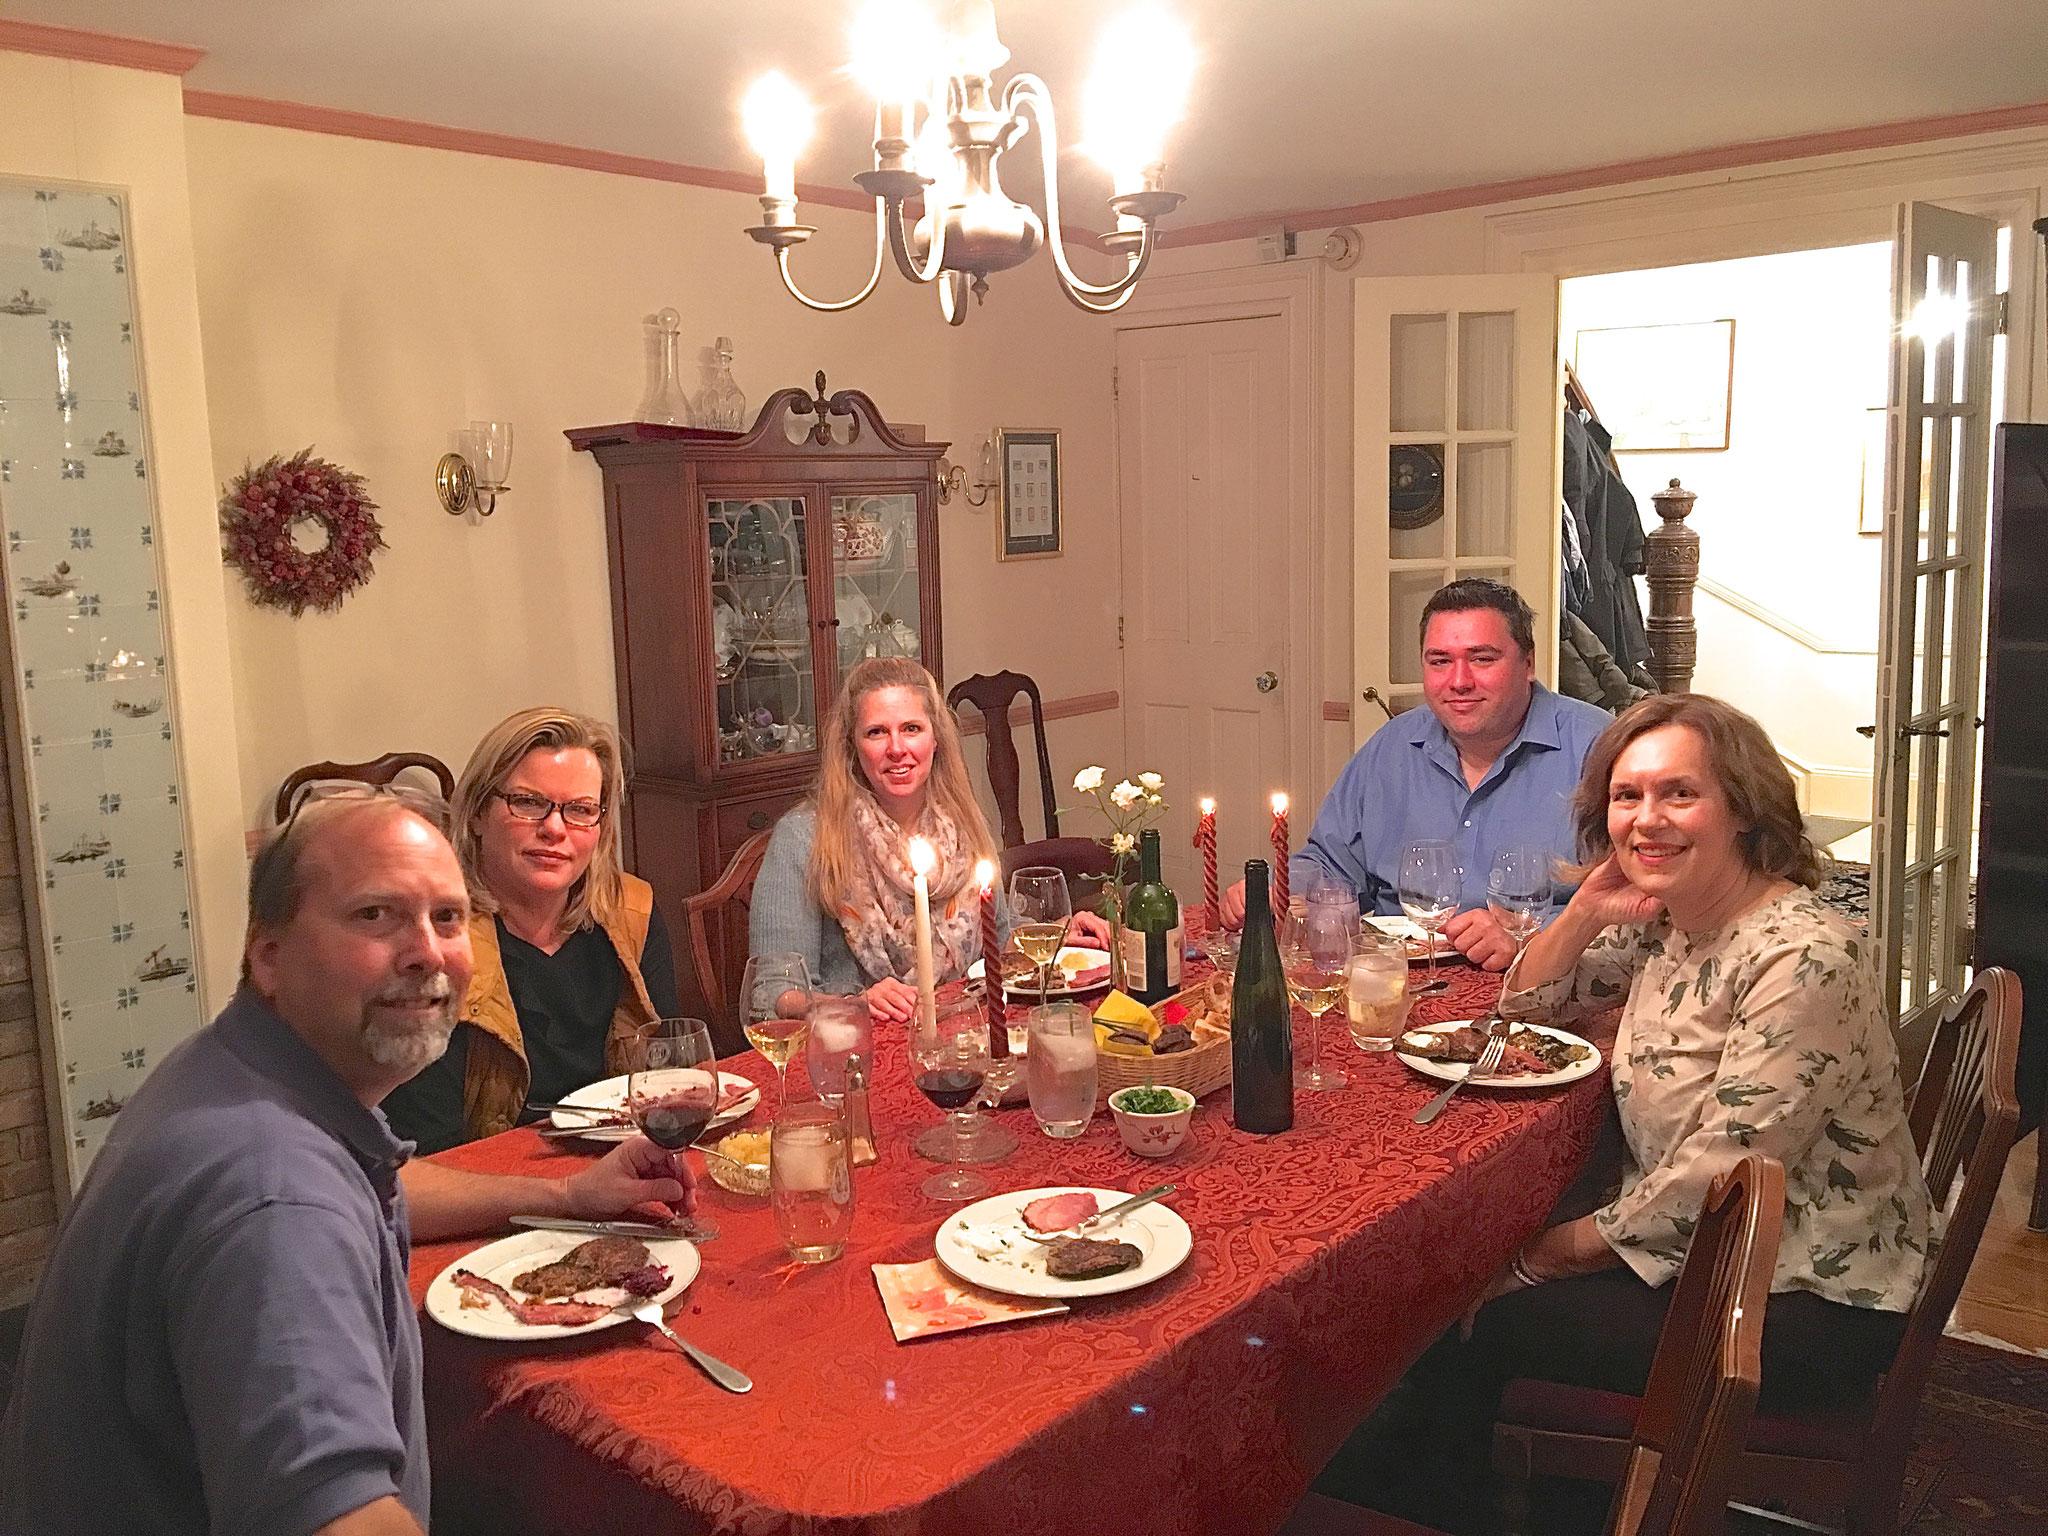 Jerry Sroka, Celeste, Lisa Sroka, Greg Wagner, Lorraine Gudas, Nov. 2016 NYC